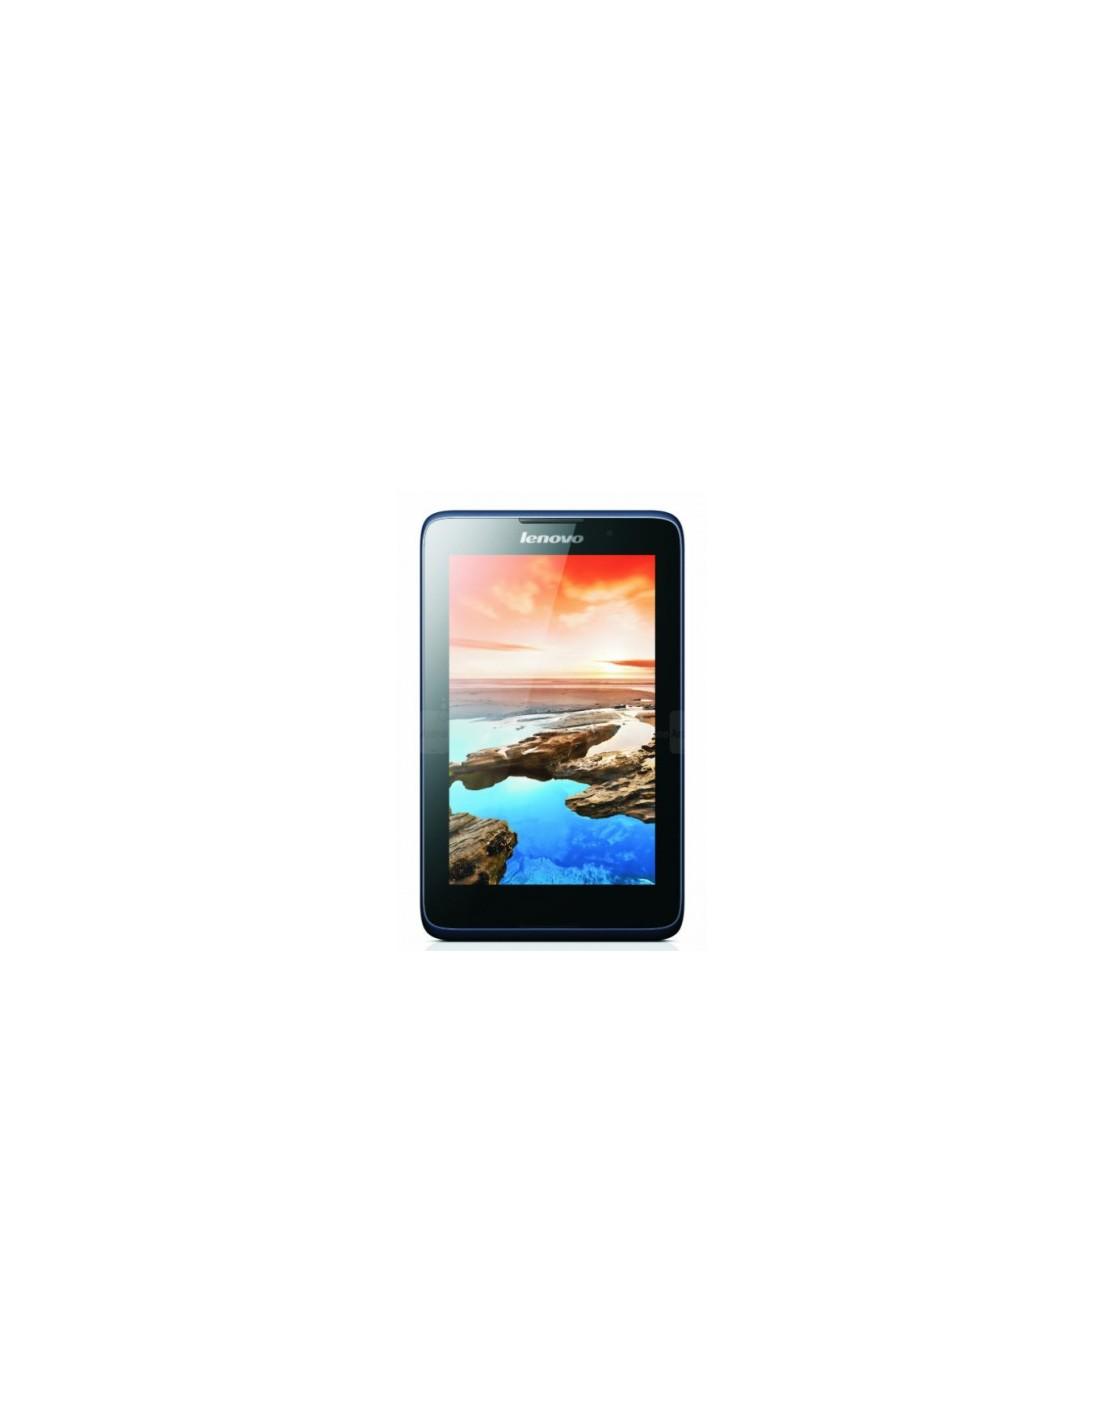 Fonepad Tablette 3g Wi Fi Lenovo A7 50 A3500 Hv 7 16 Gb Midnight Blue Idea Tab